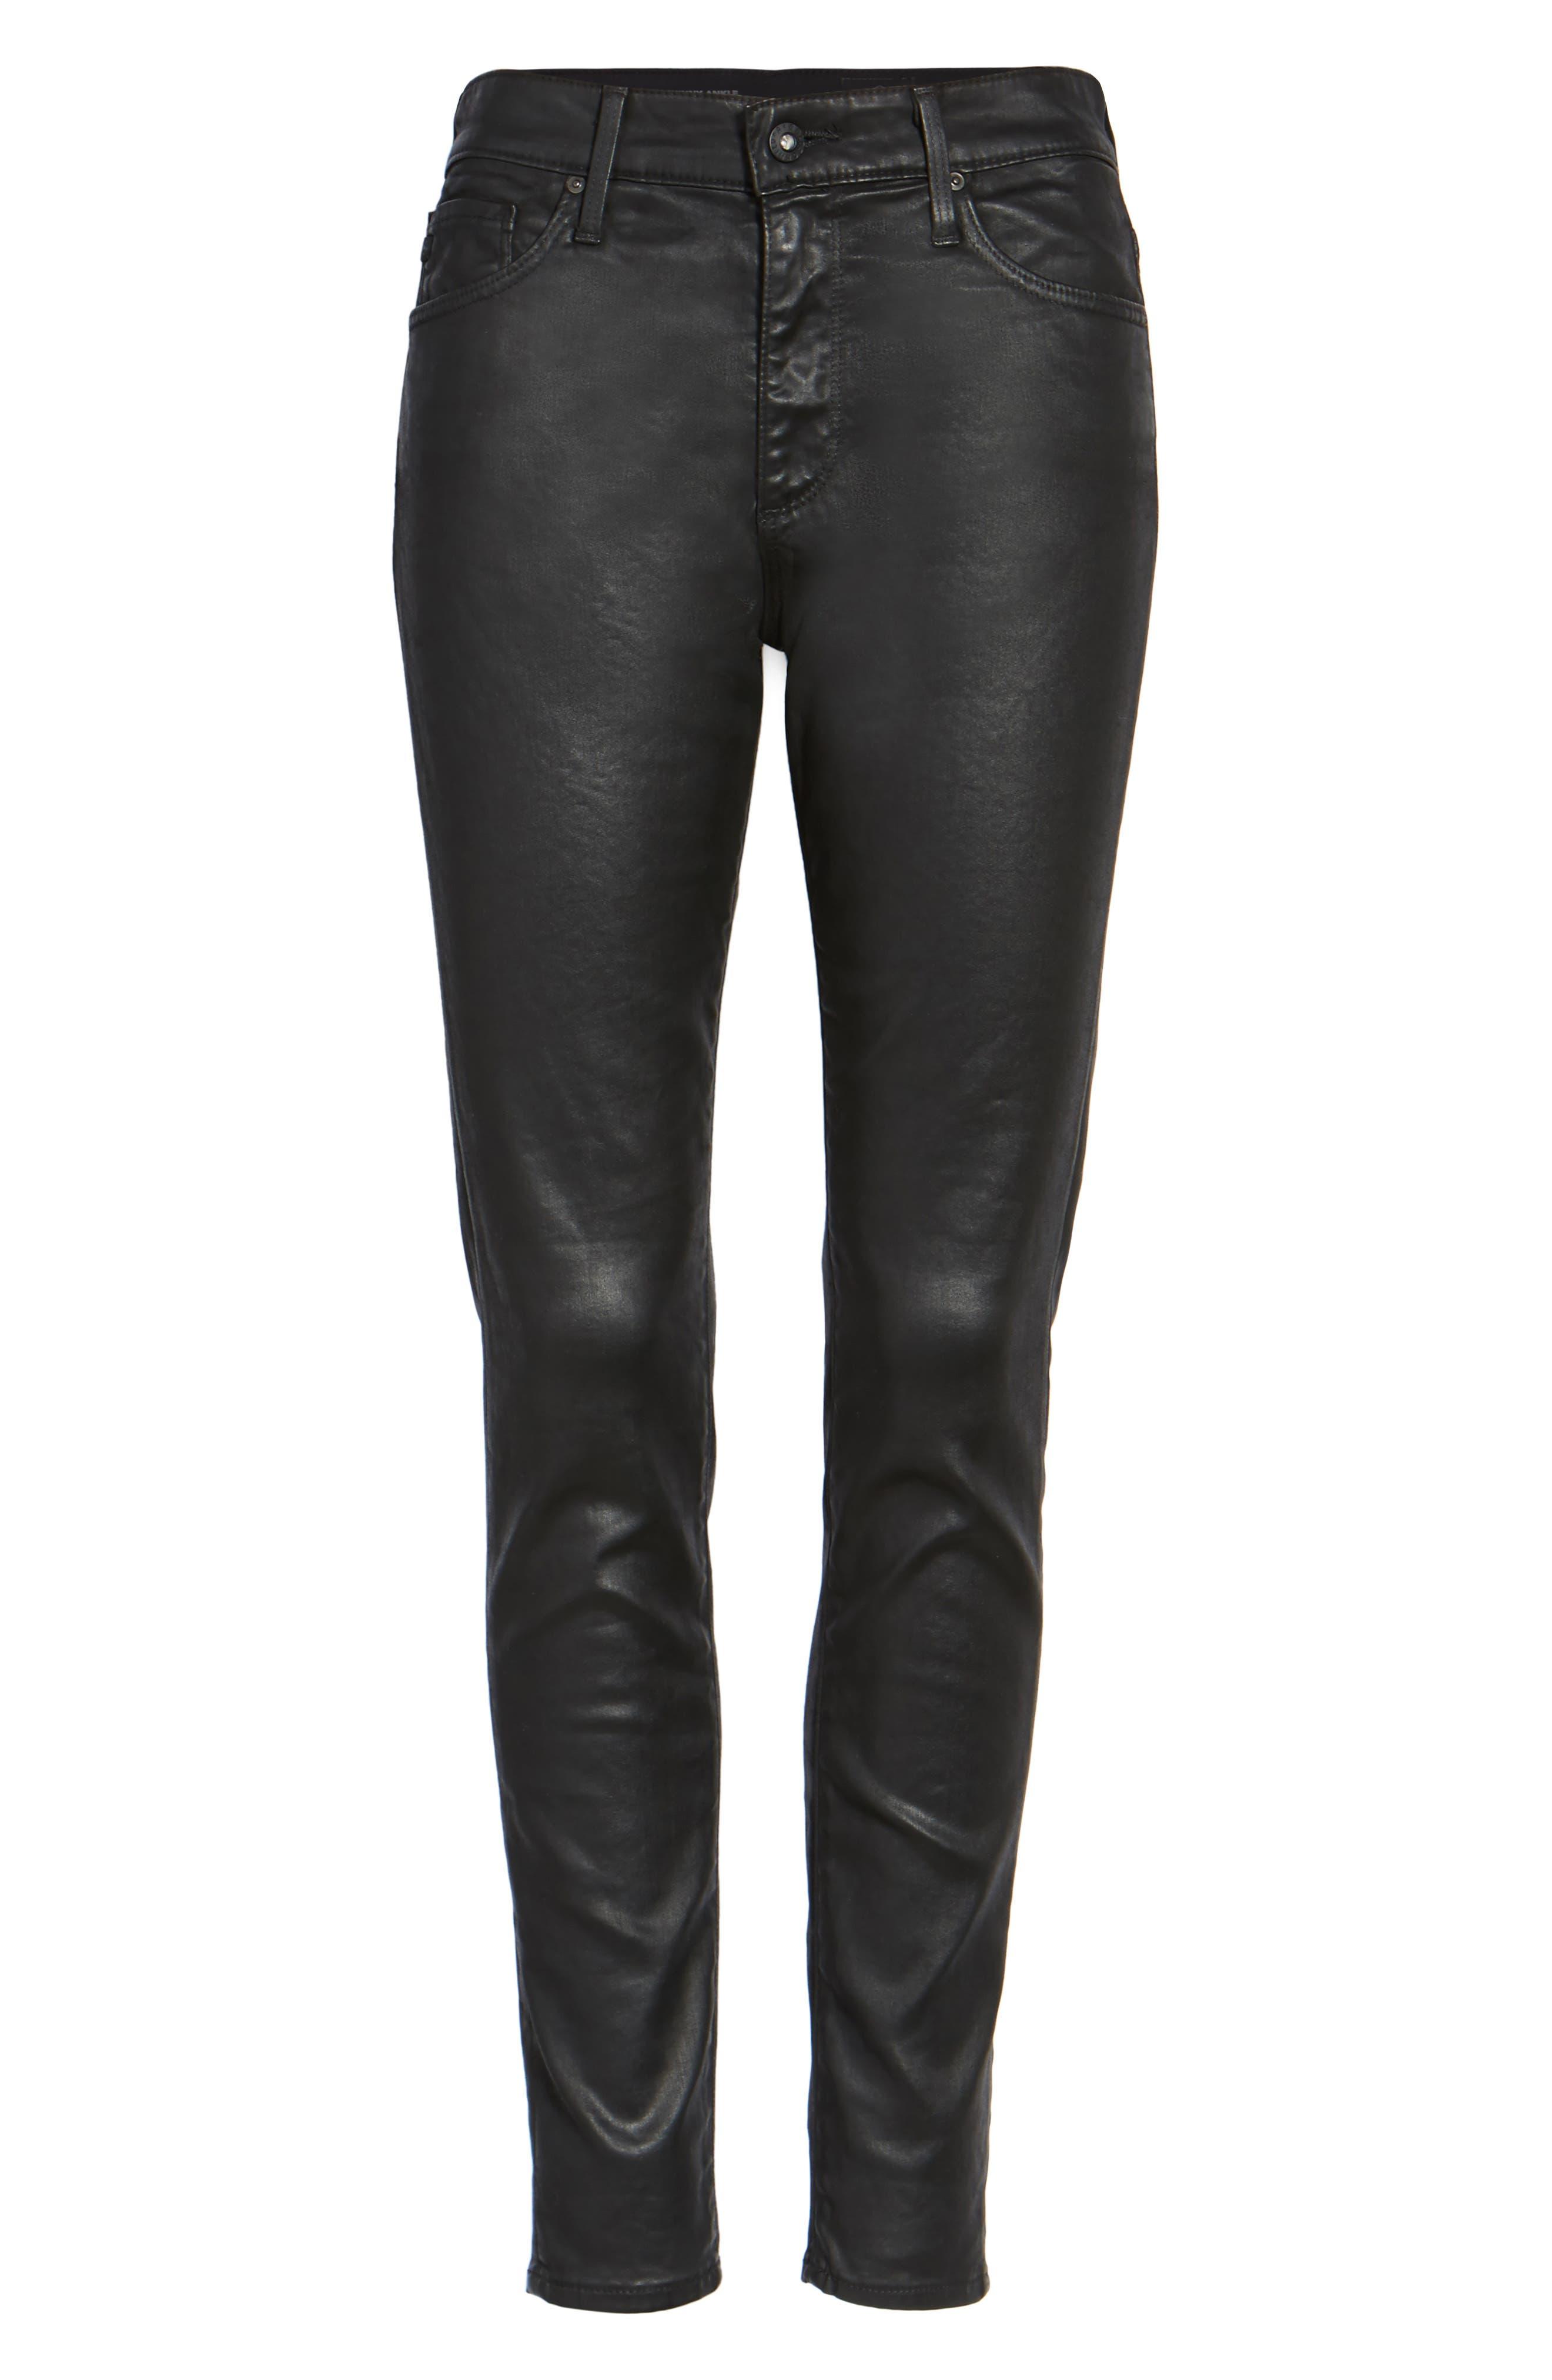 Farrah High Waist Ankle Skinny Jeans,                             Alternate thumbnail 7, color,                             LEATHERETTE SUPER BLACK